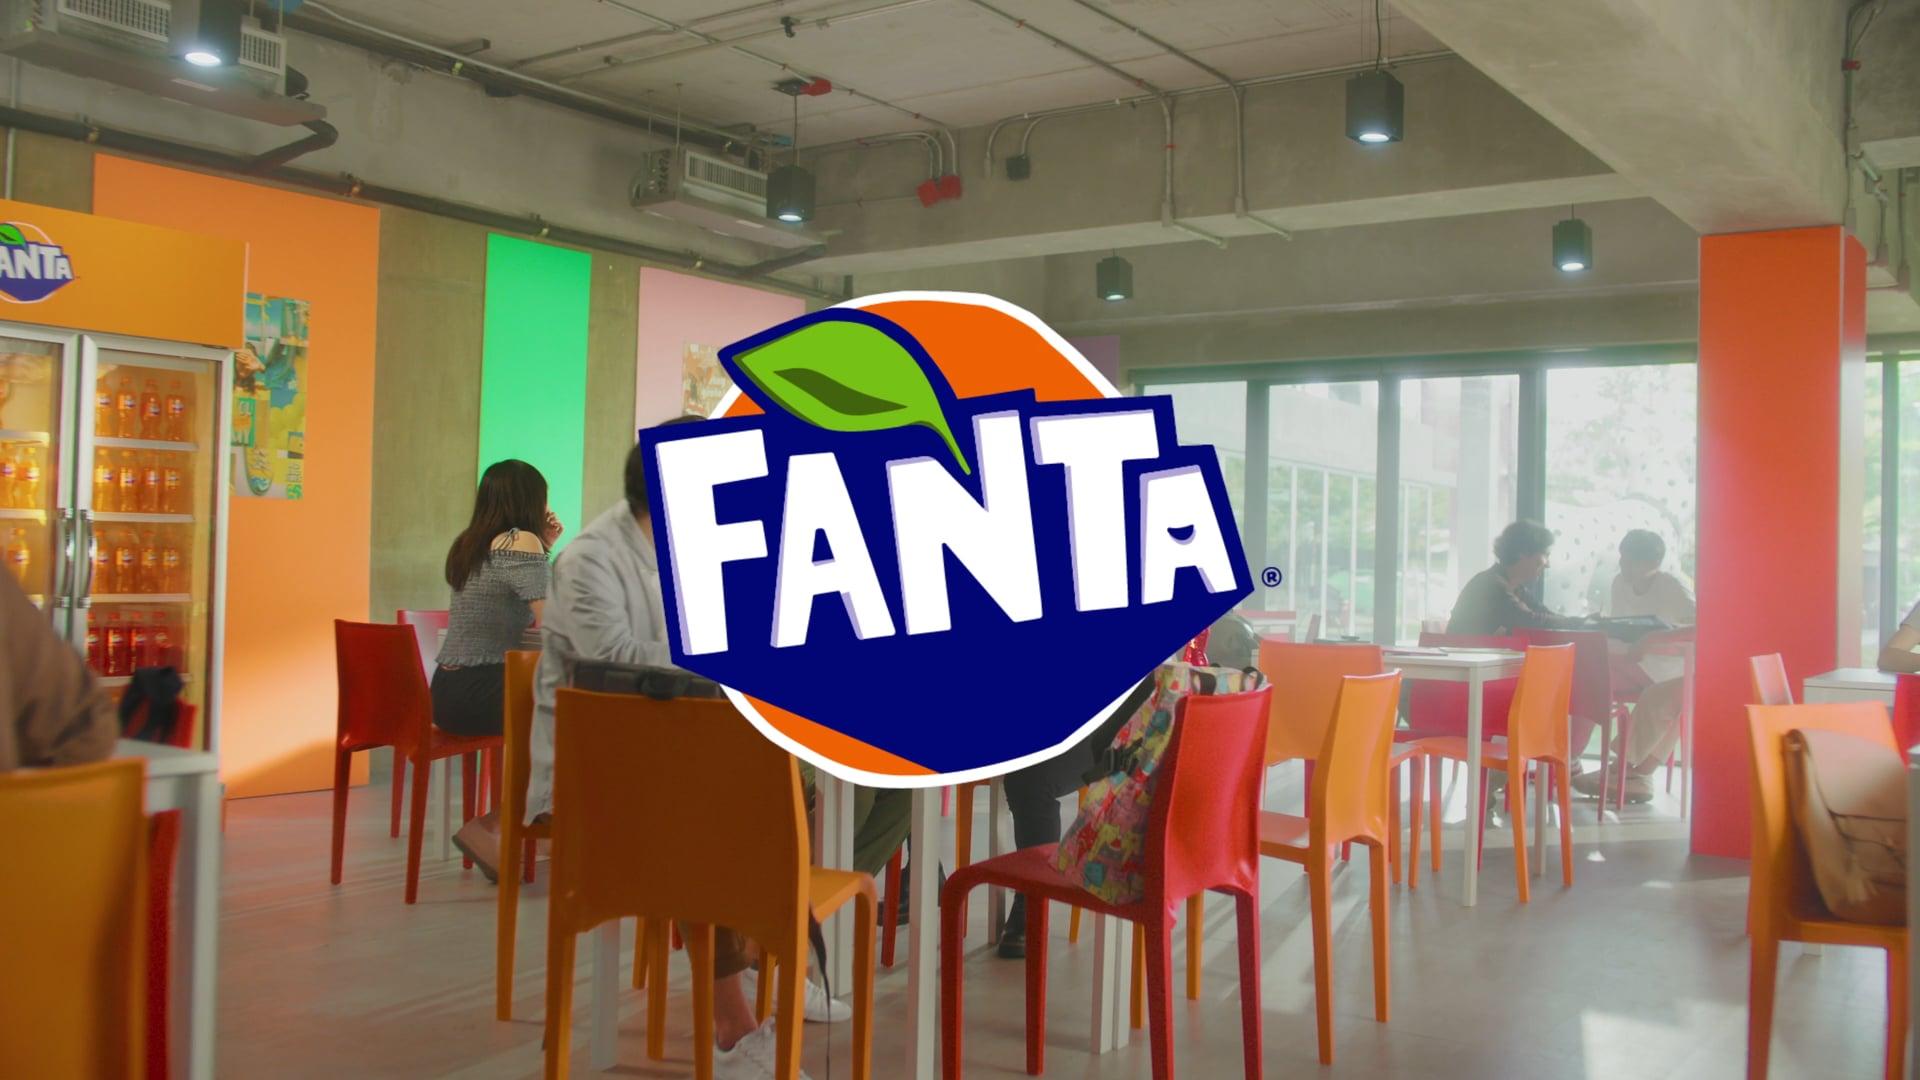 Fanta   Canteen (Indonesia)